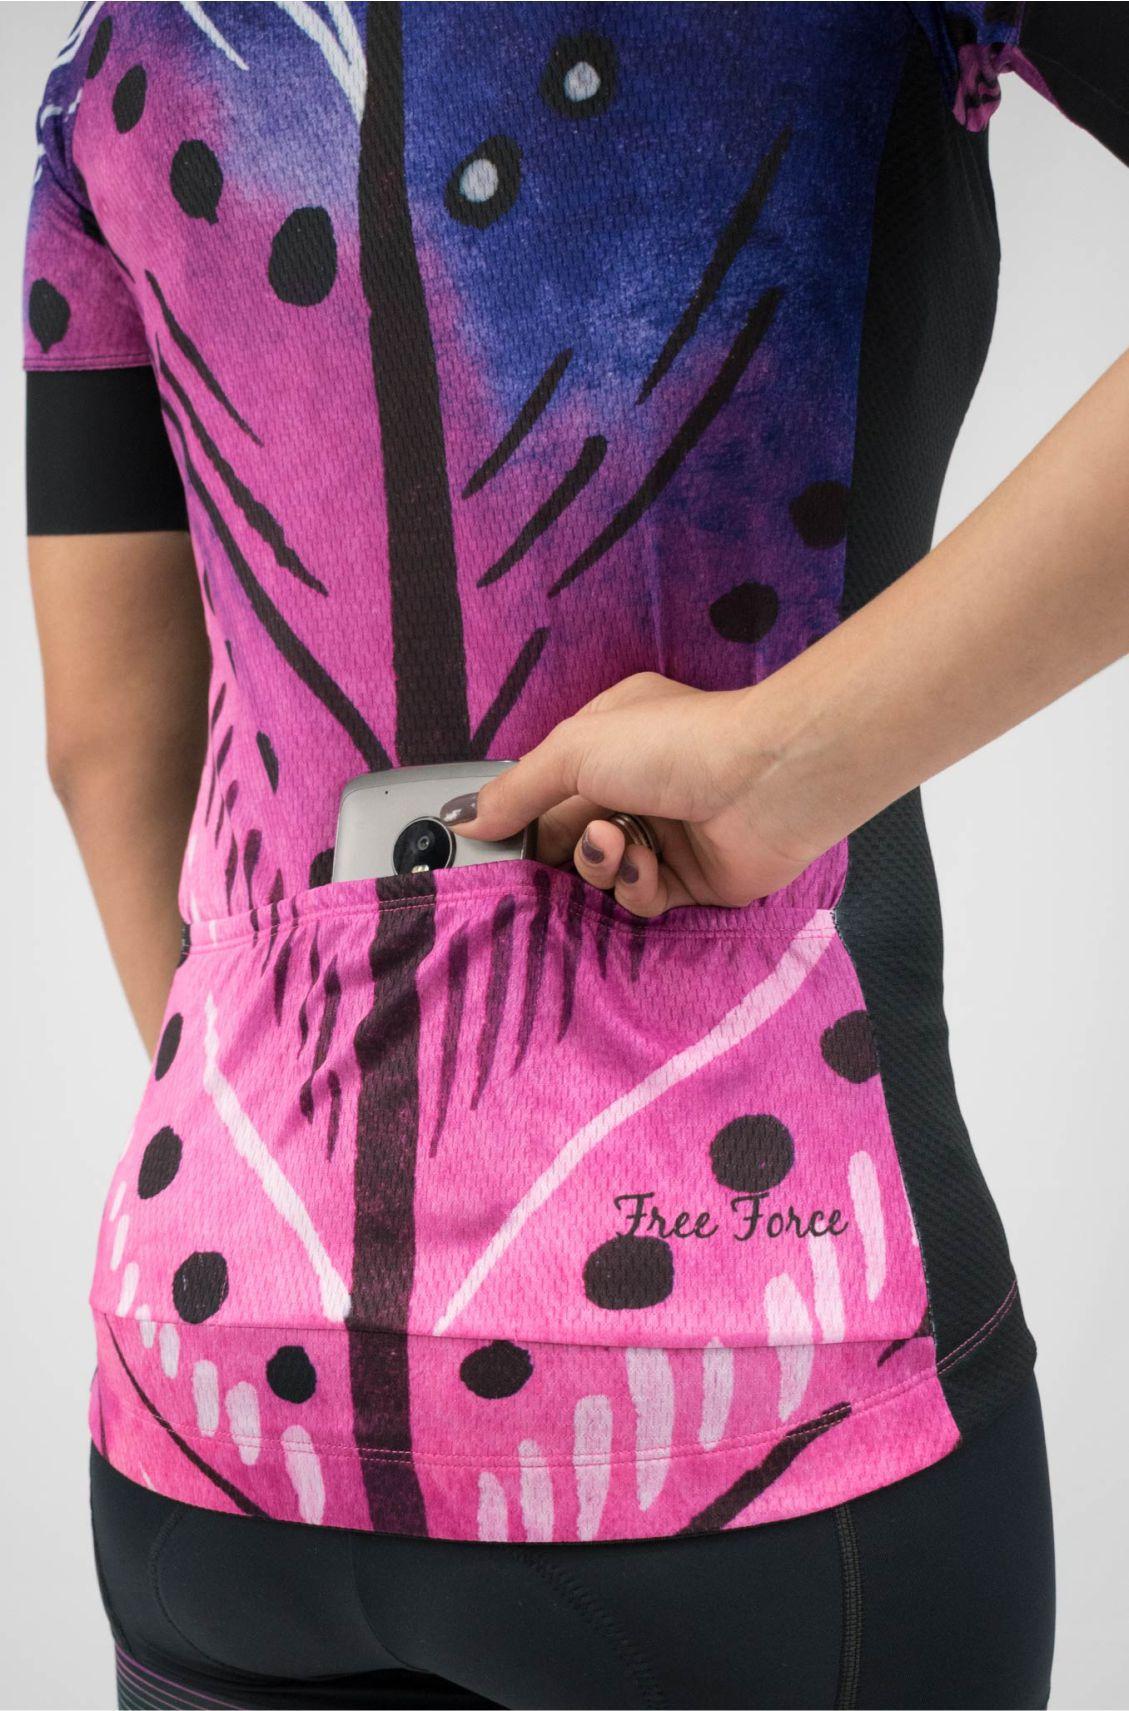 Camisa de Ciclismo Feminina Sport Plume Free Force